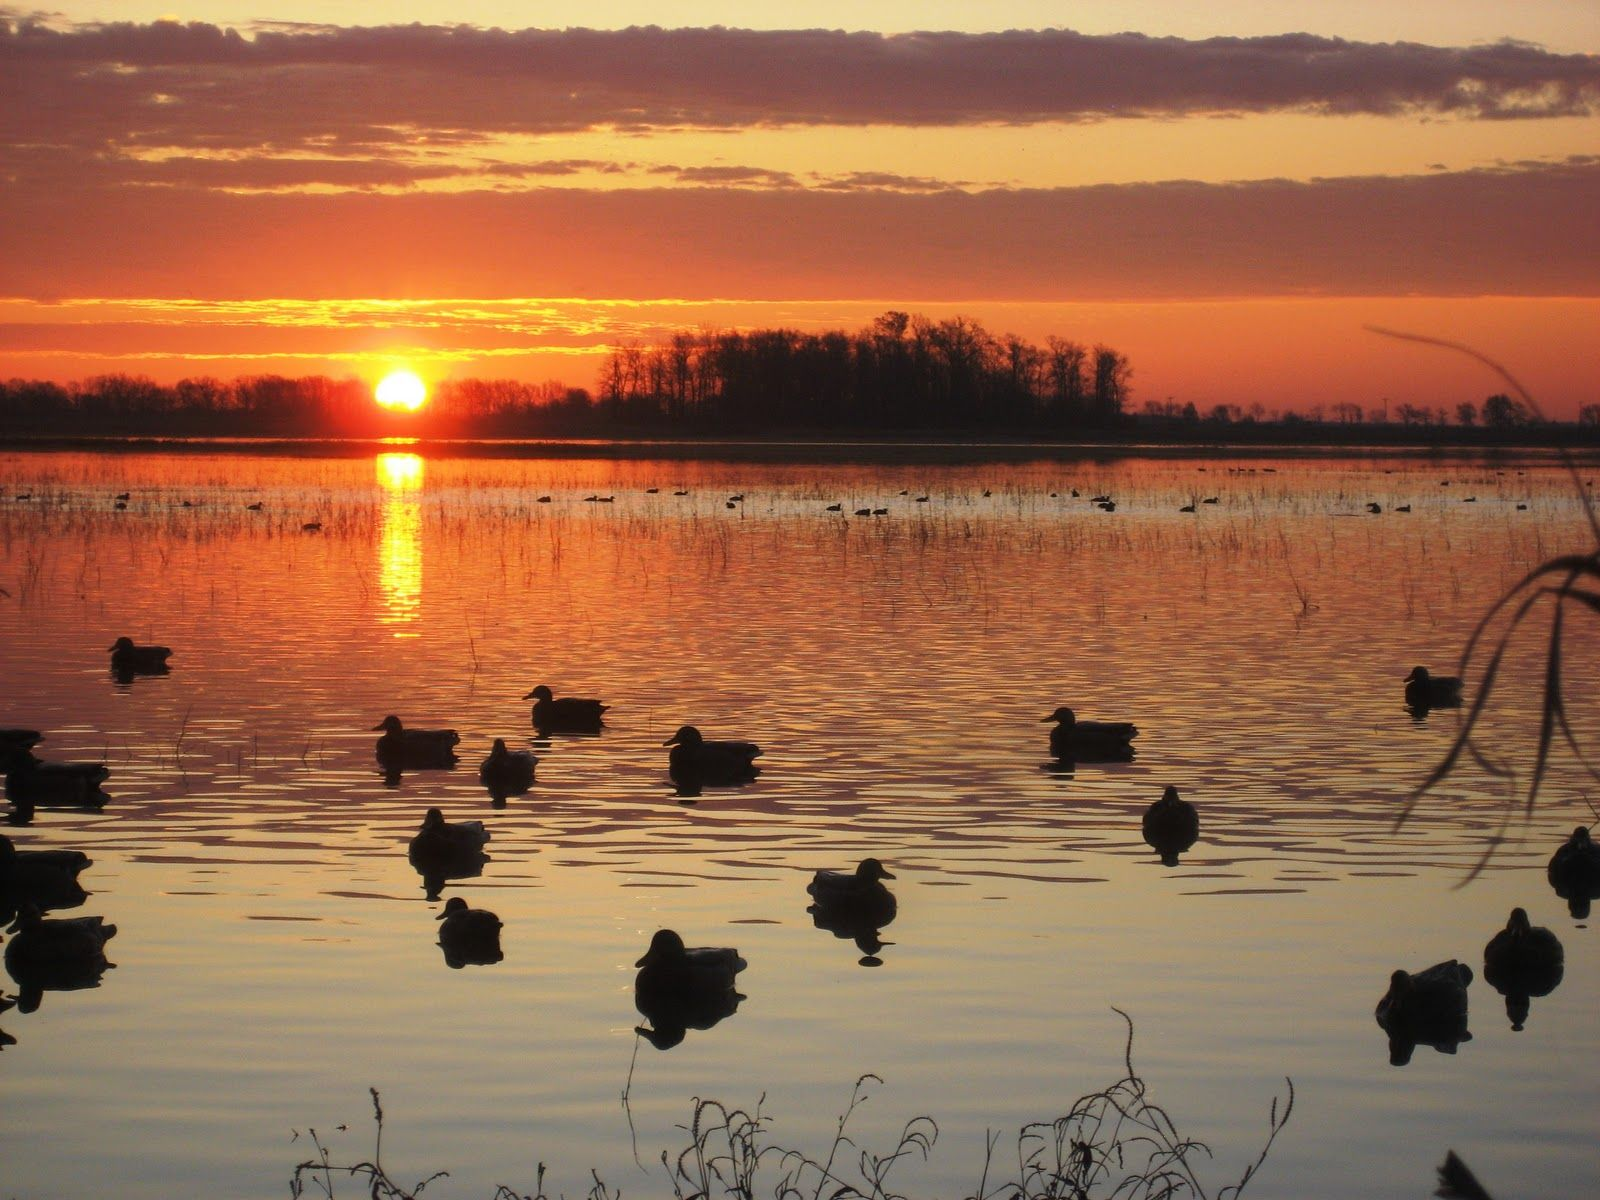 Animals Ducks Unlimited 1600x1200px Hd Widescreen Picture Hunting Wallpaper Duck Wallpaper Duck Pictures